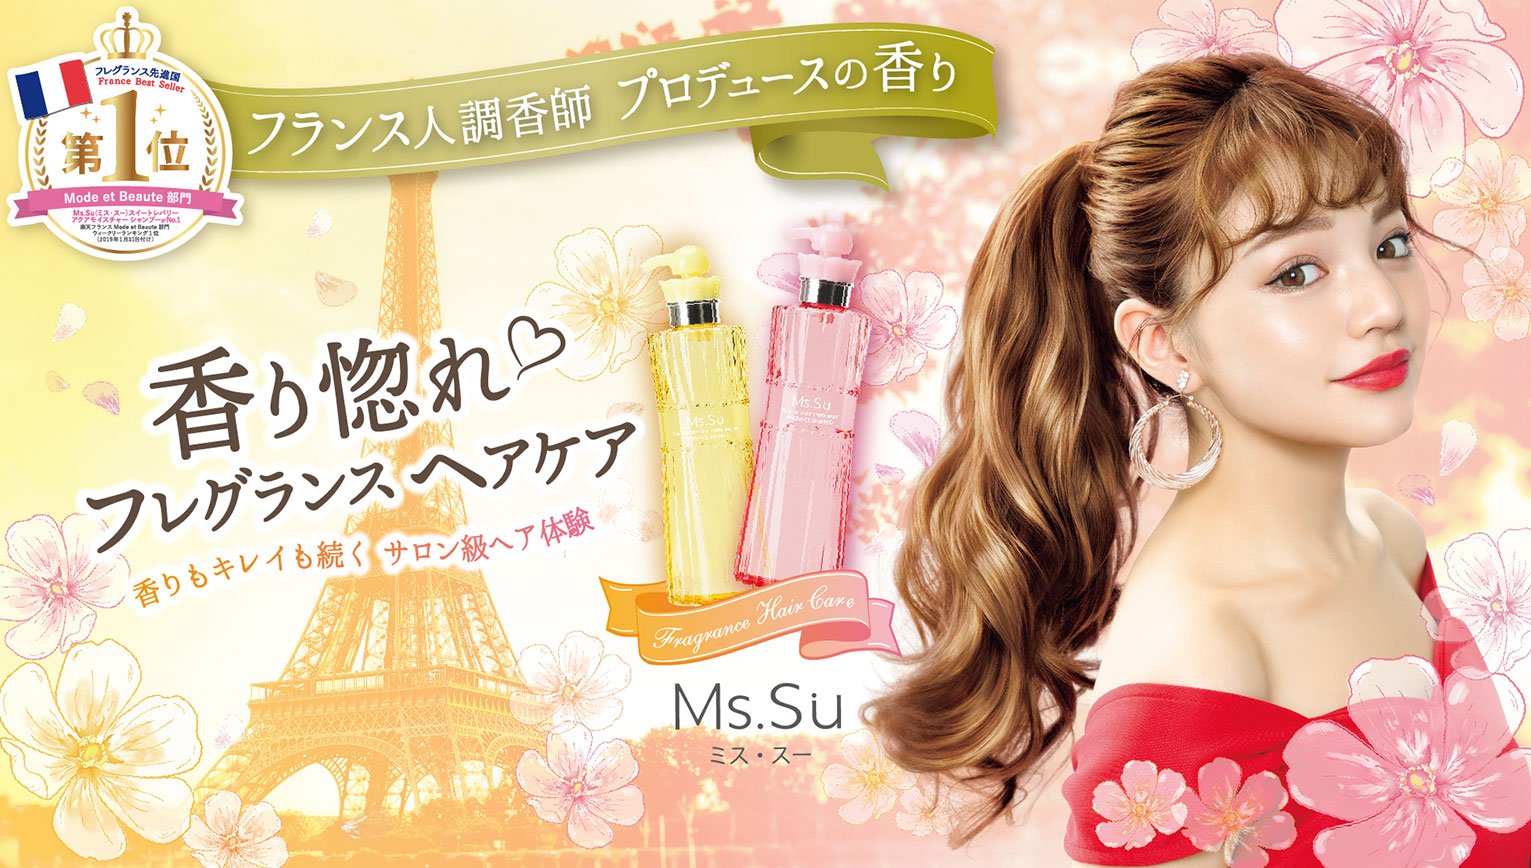 Ms.Su:RV